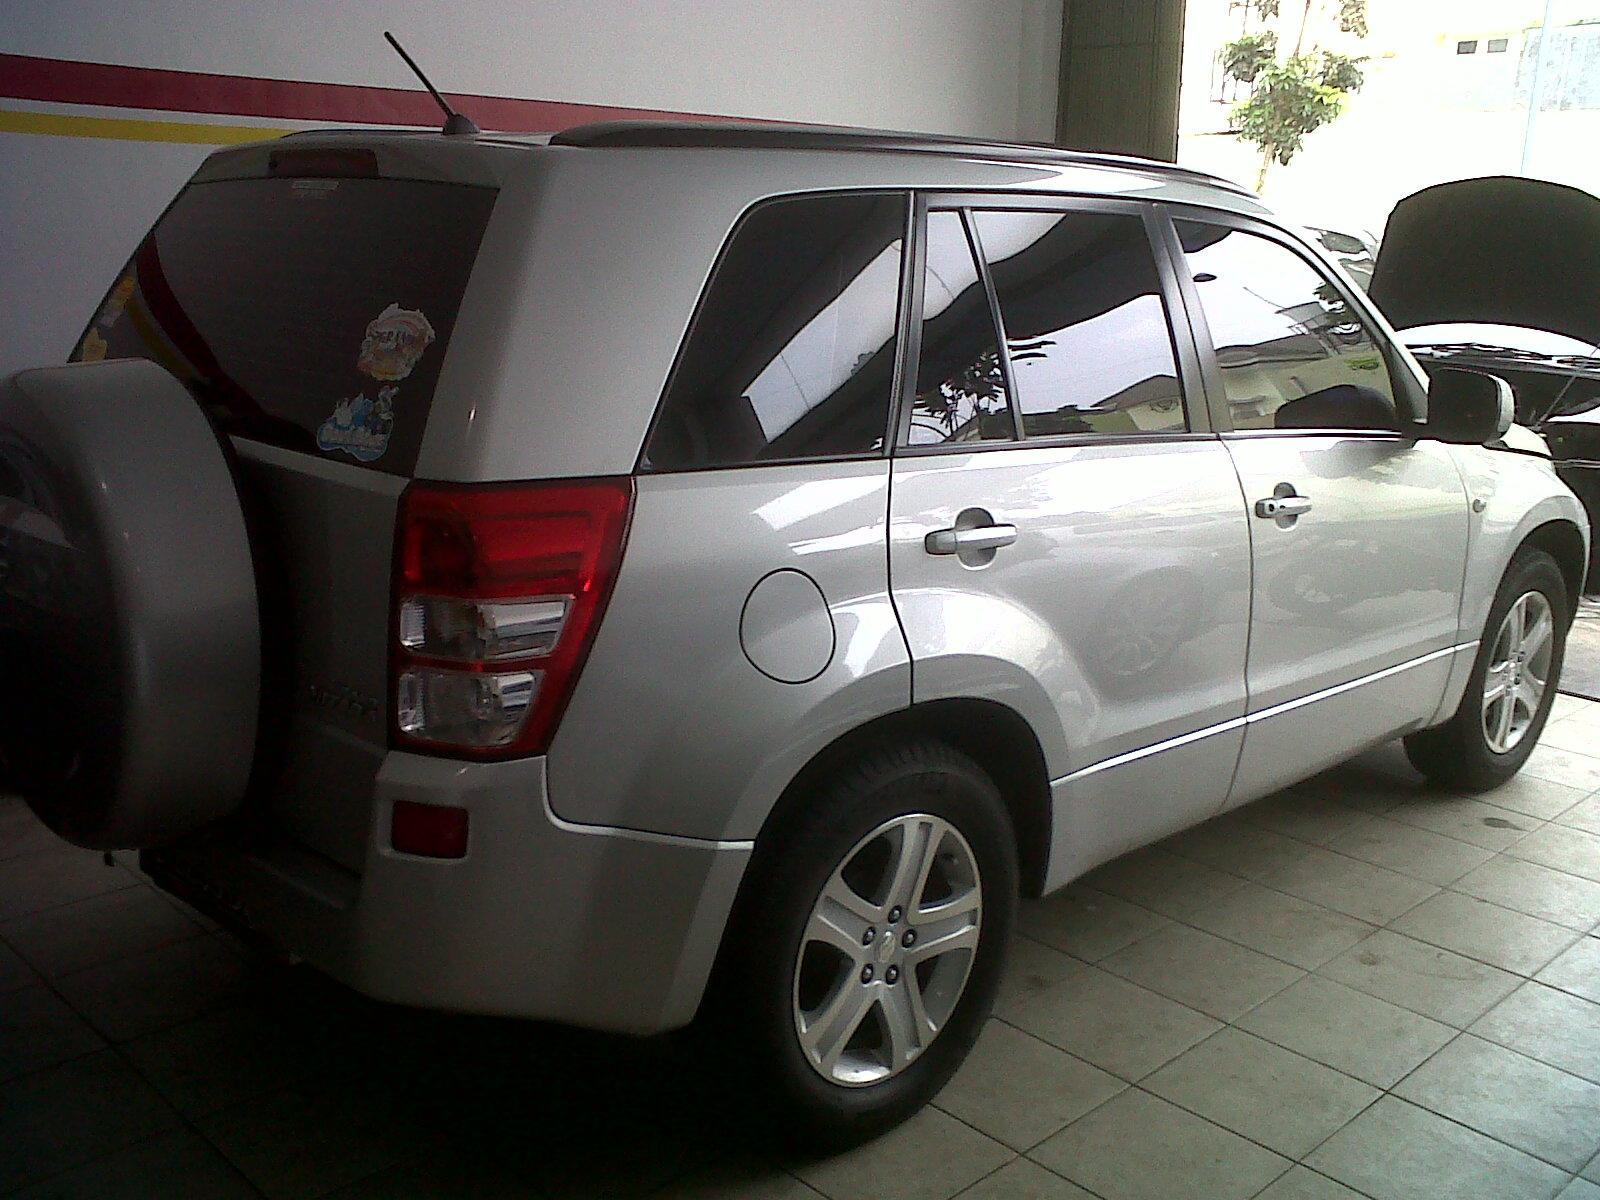 Harga Mobil Bekas Grand Vitara Malang – MobilSecond.Info